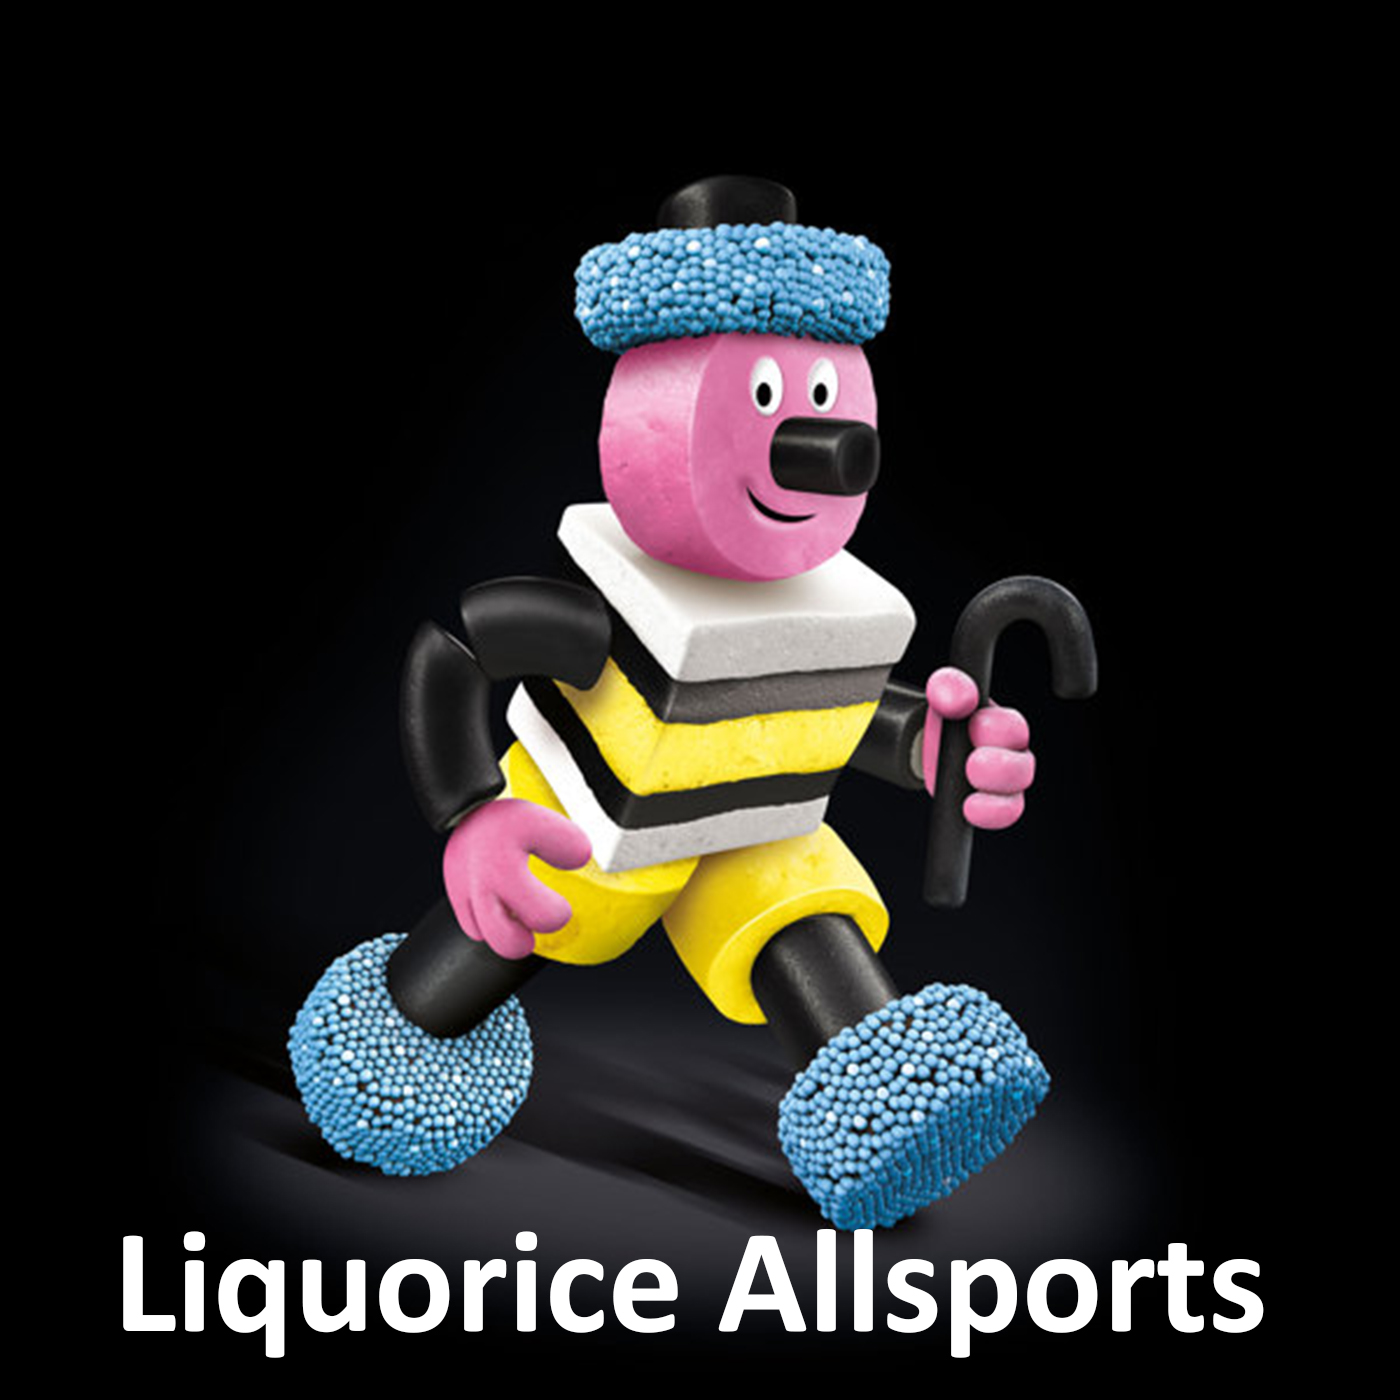 Liquorice Allsports Show